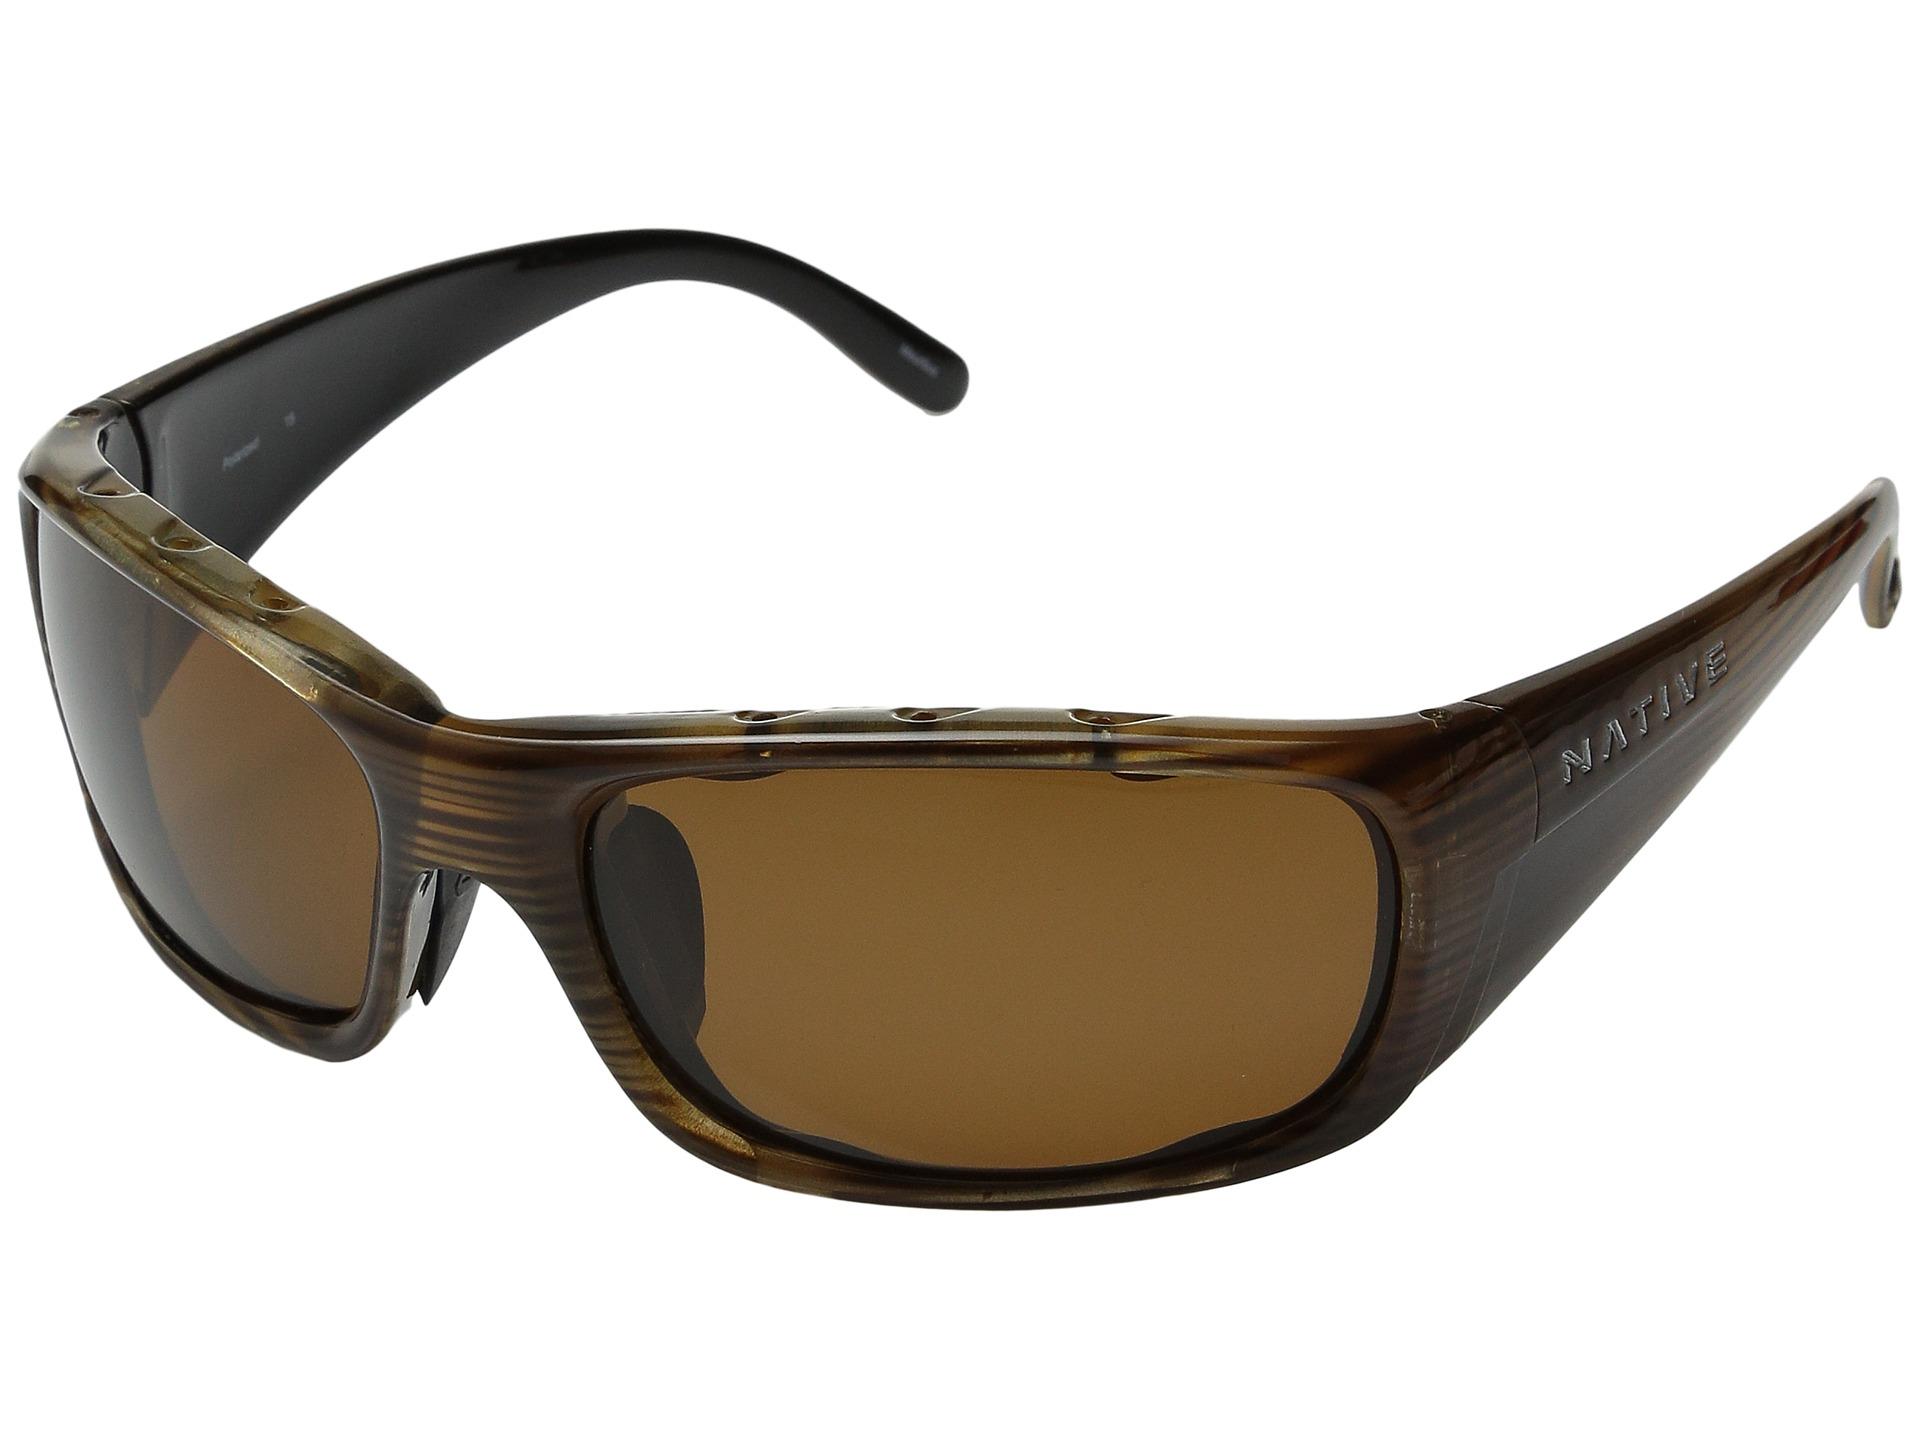 native sunglasses 4l9i  native sunglasses